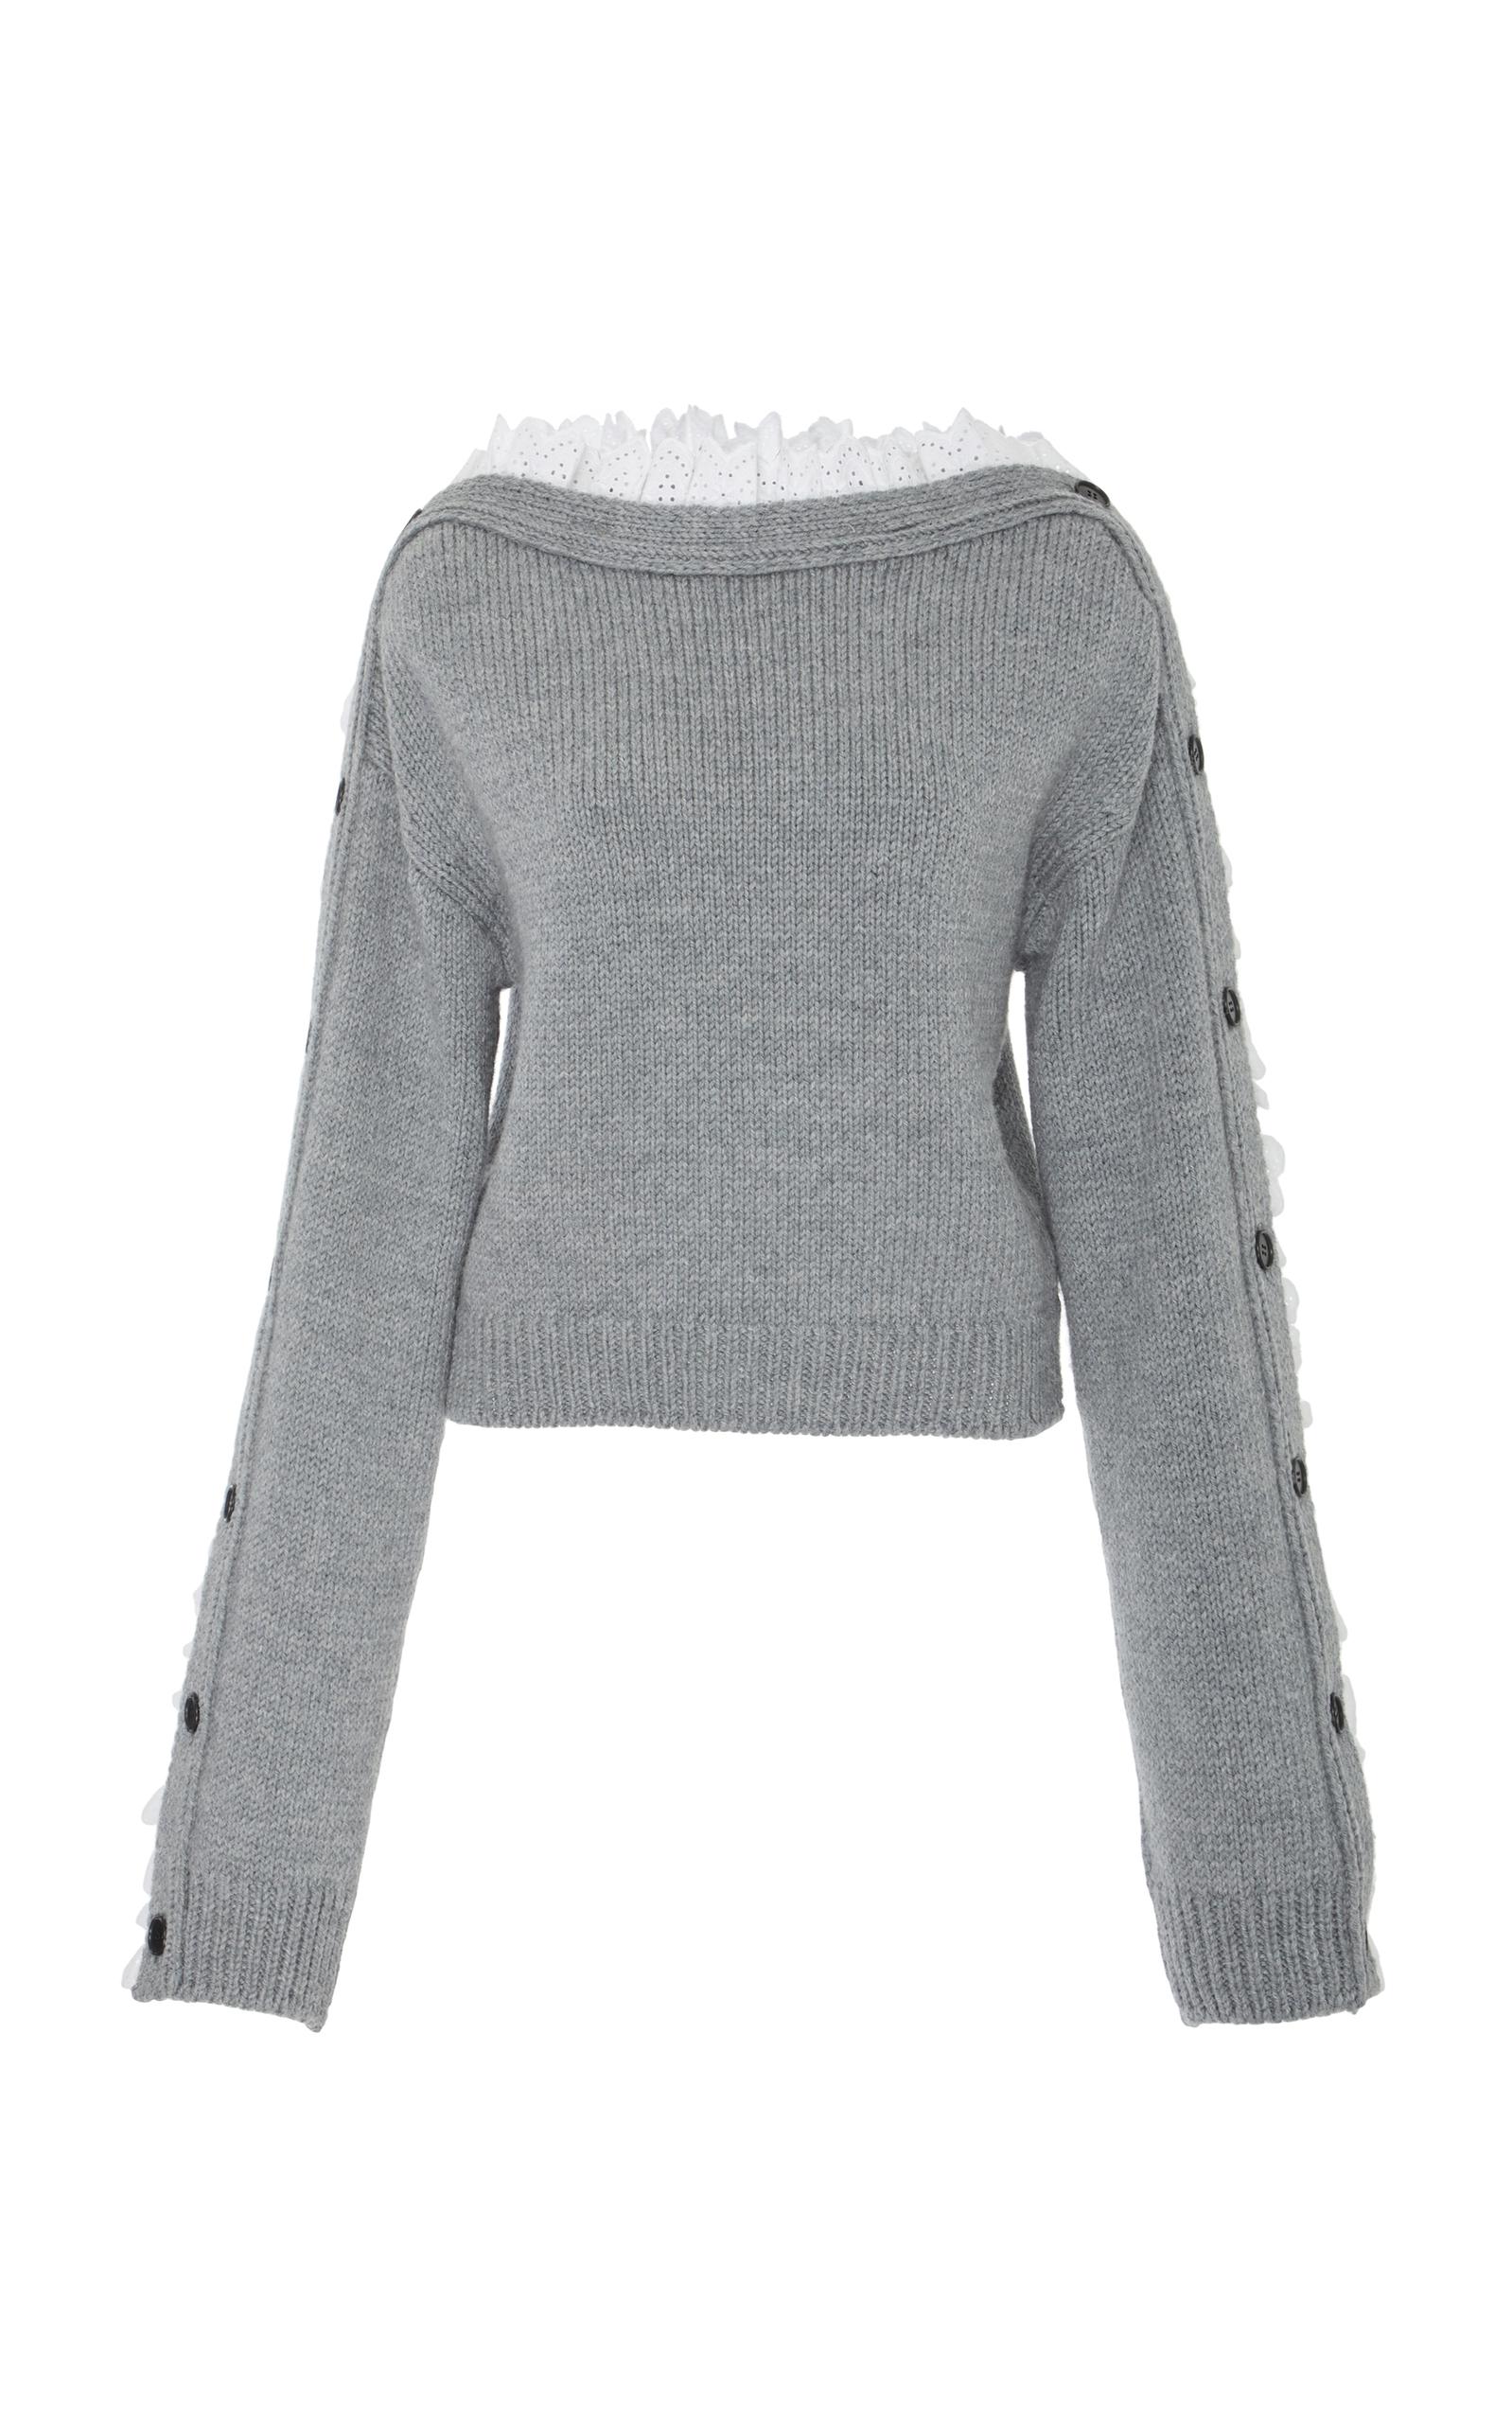 PHILOSOPHY DI LORENZO SERAFINI Lace Trimmed Pullover in Grey